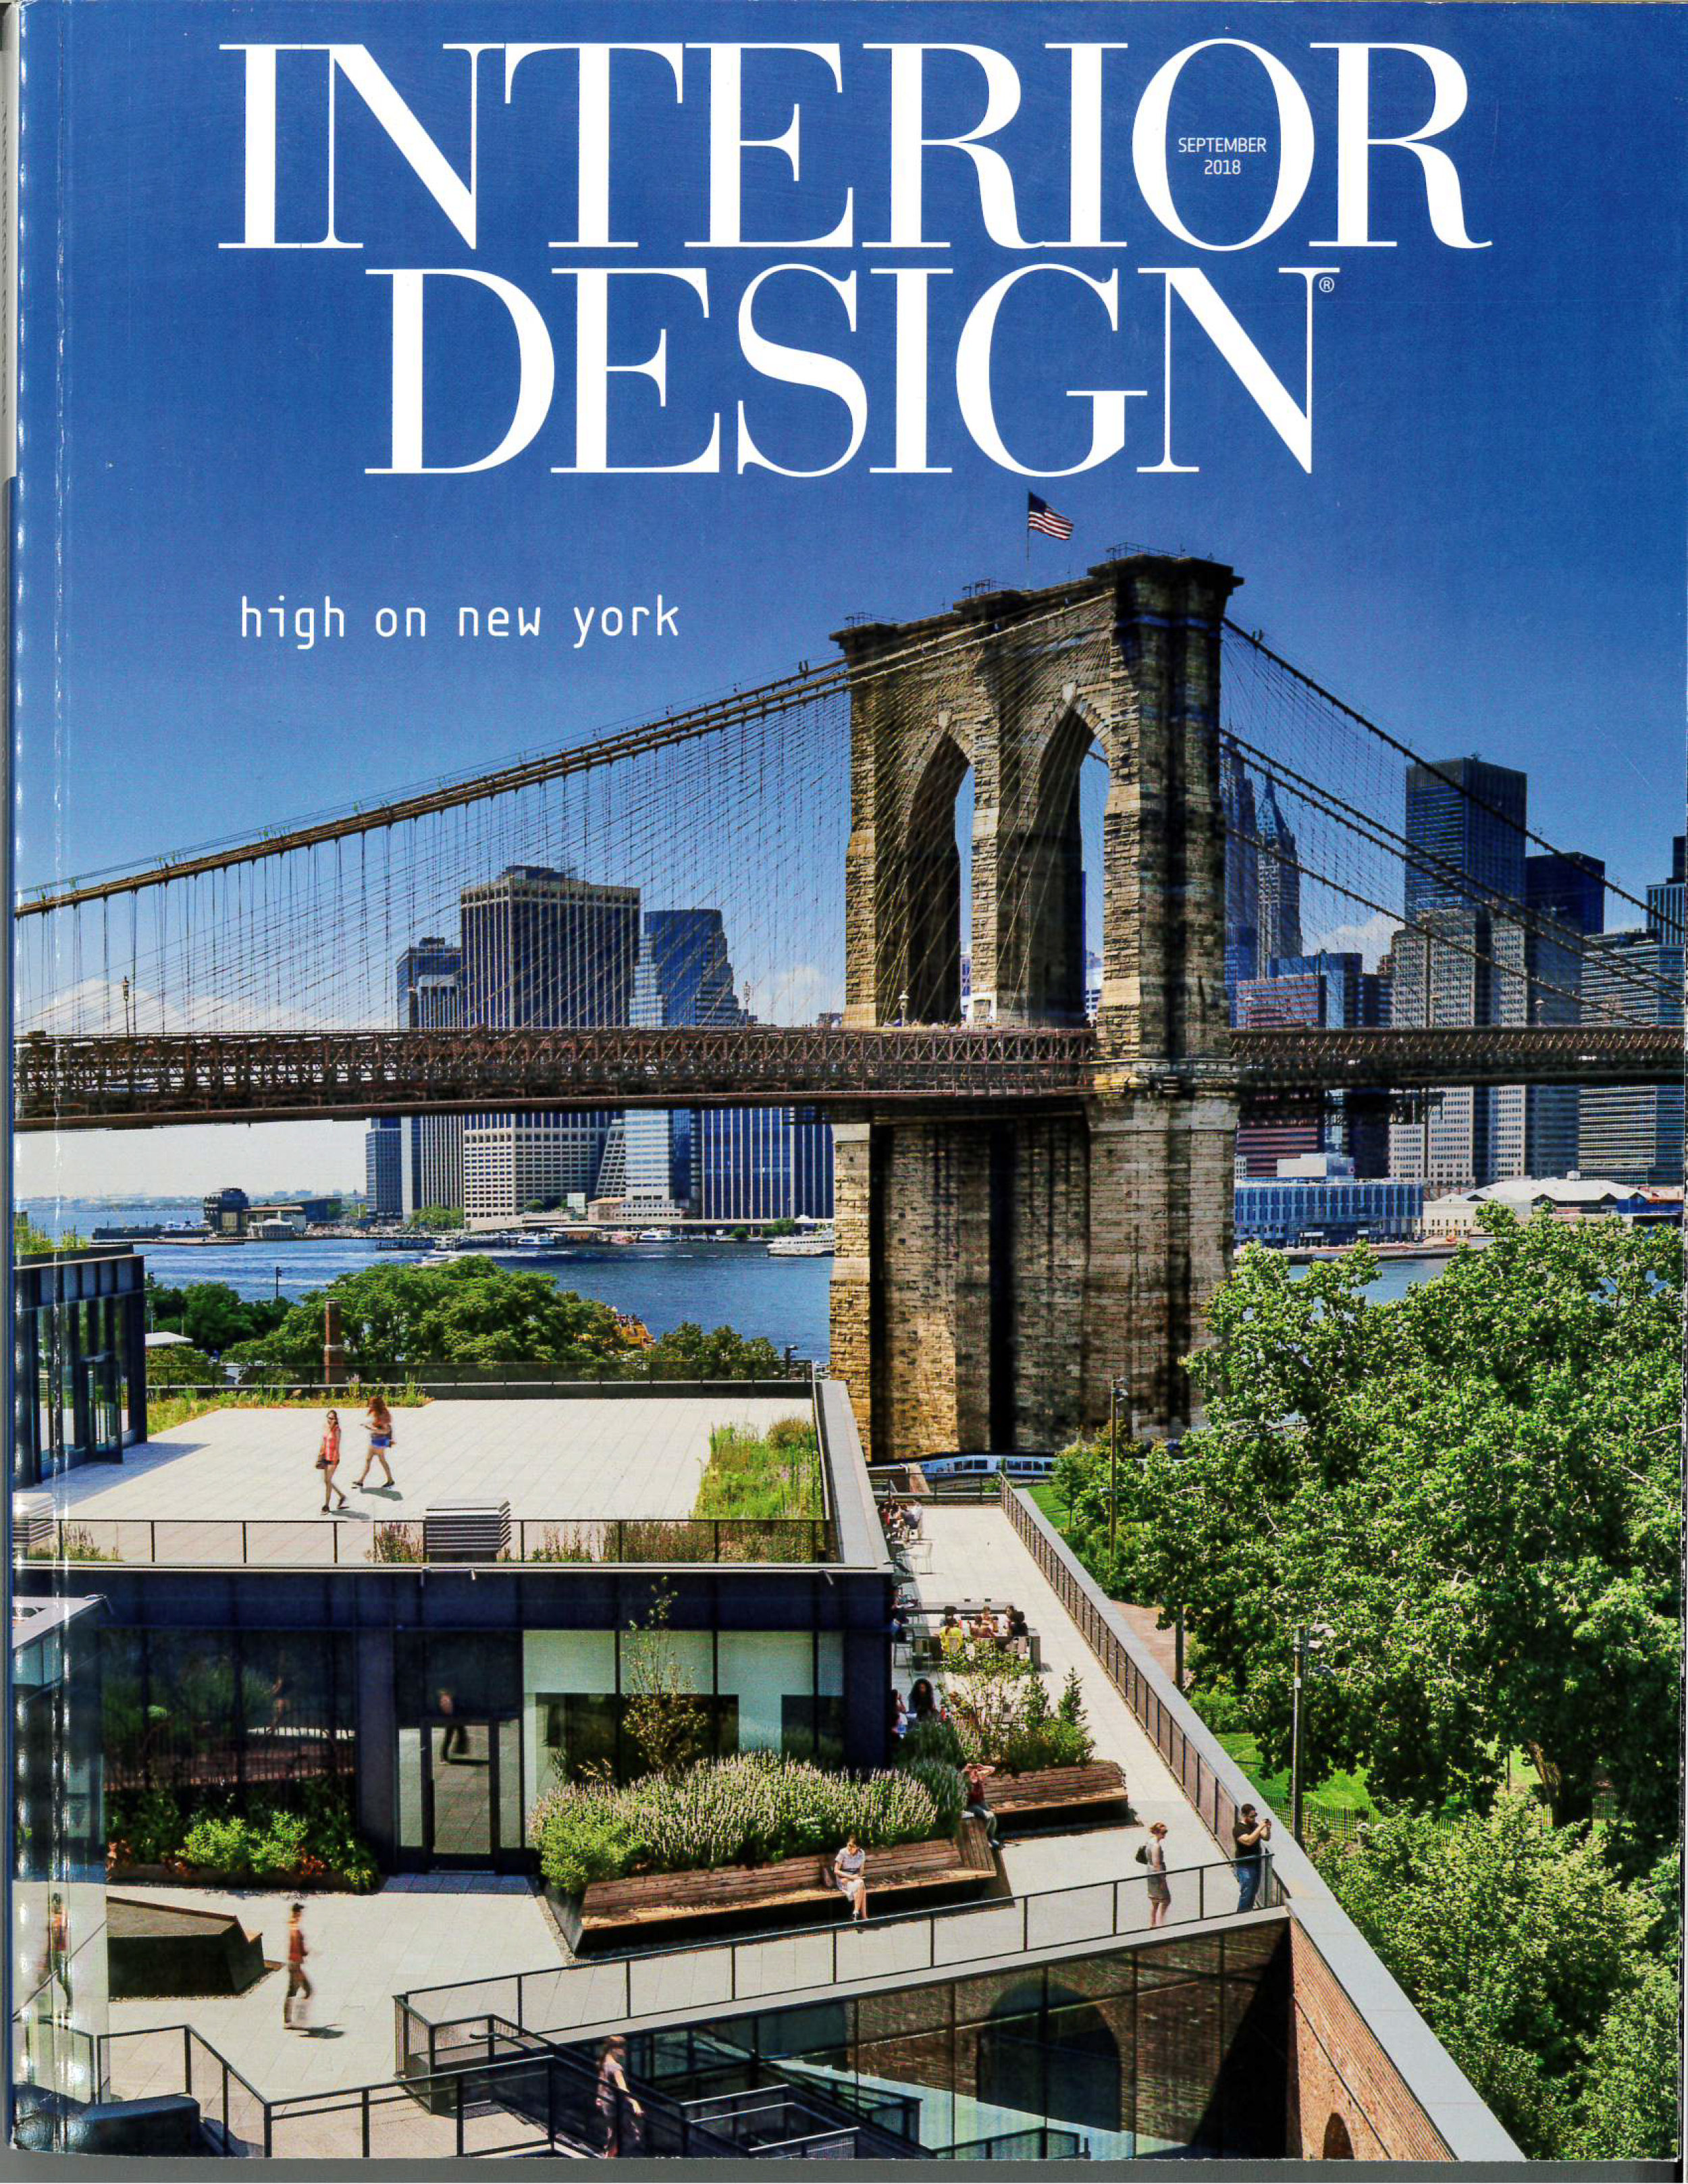 Interior Design Sept. 2018-1.jpg